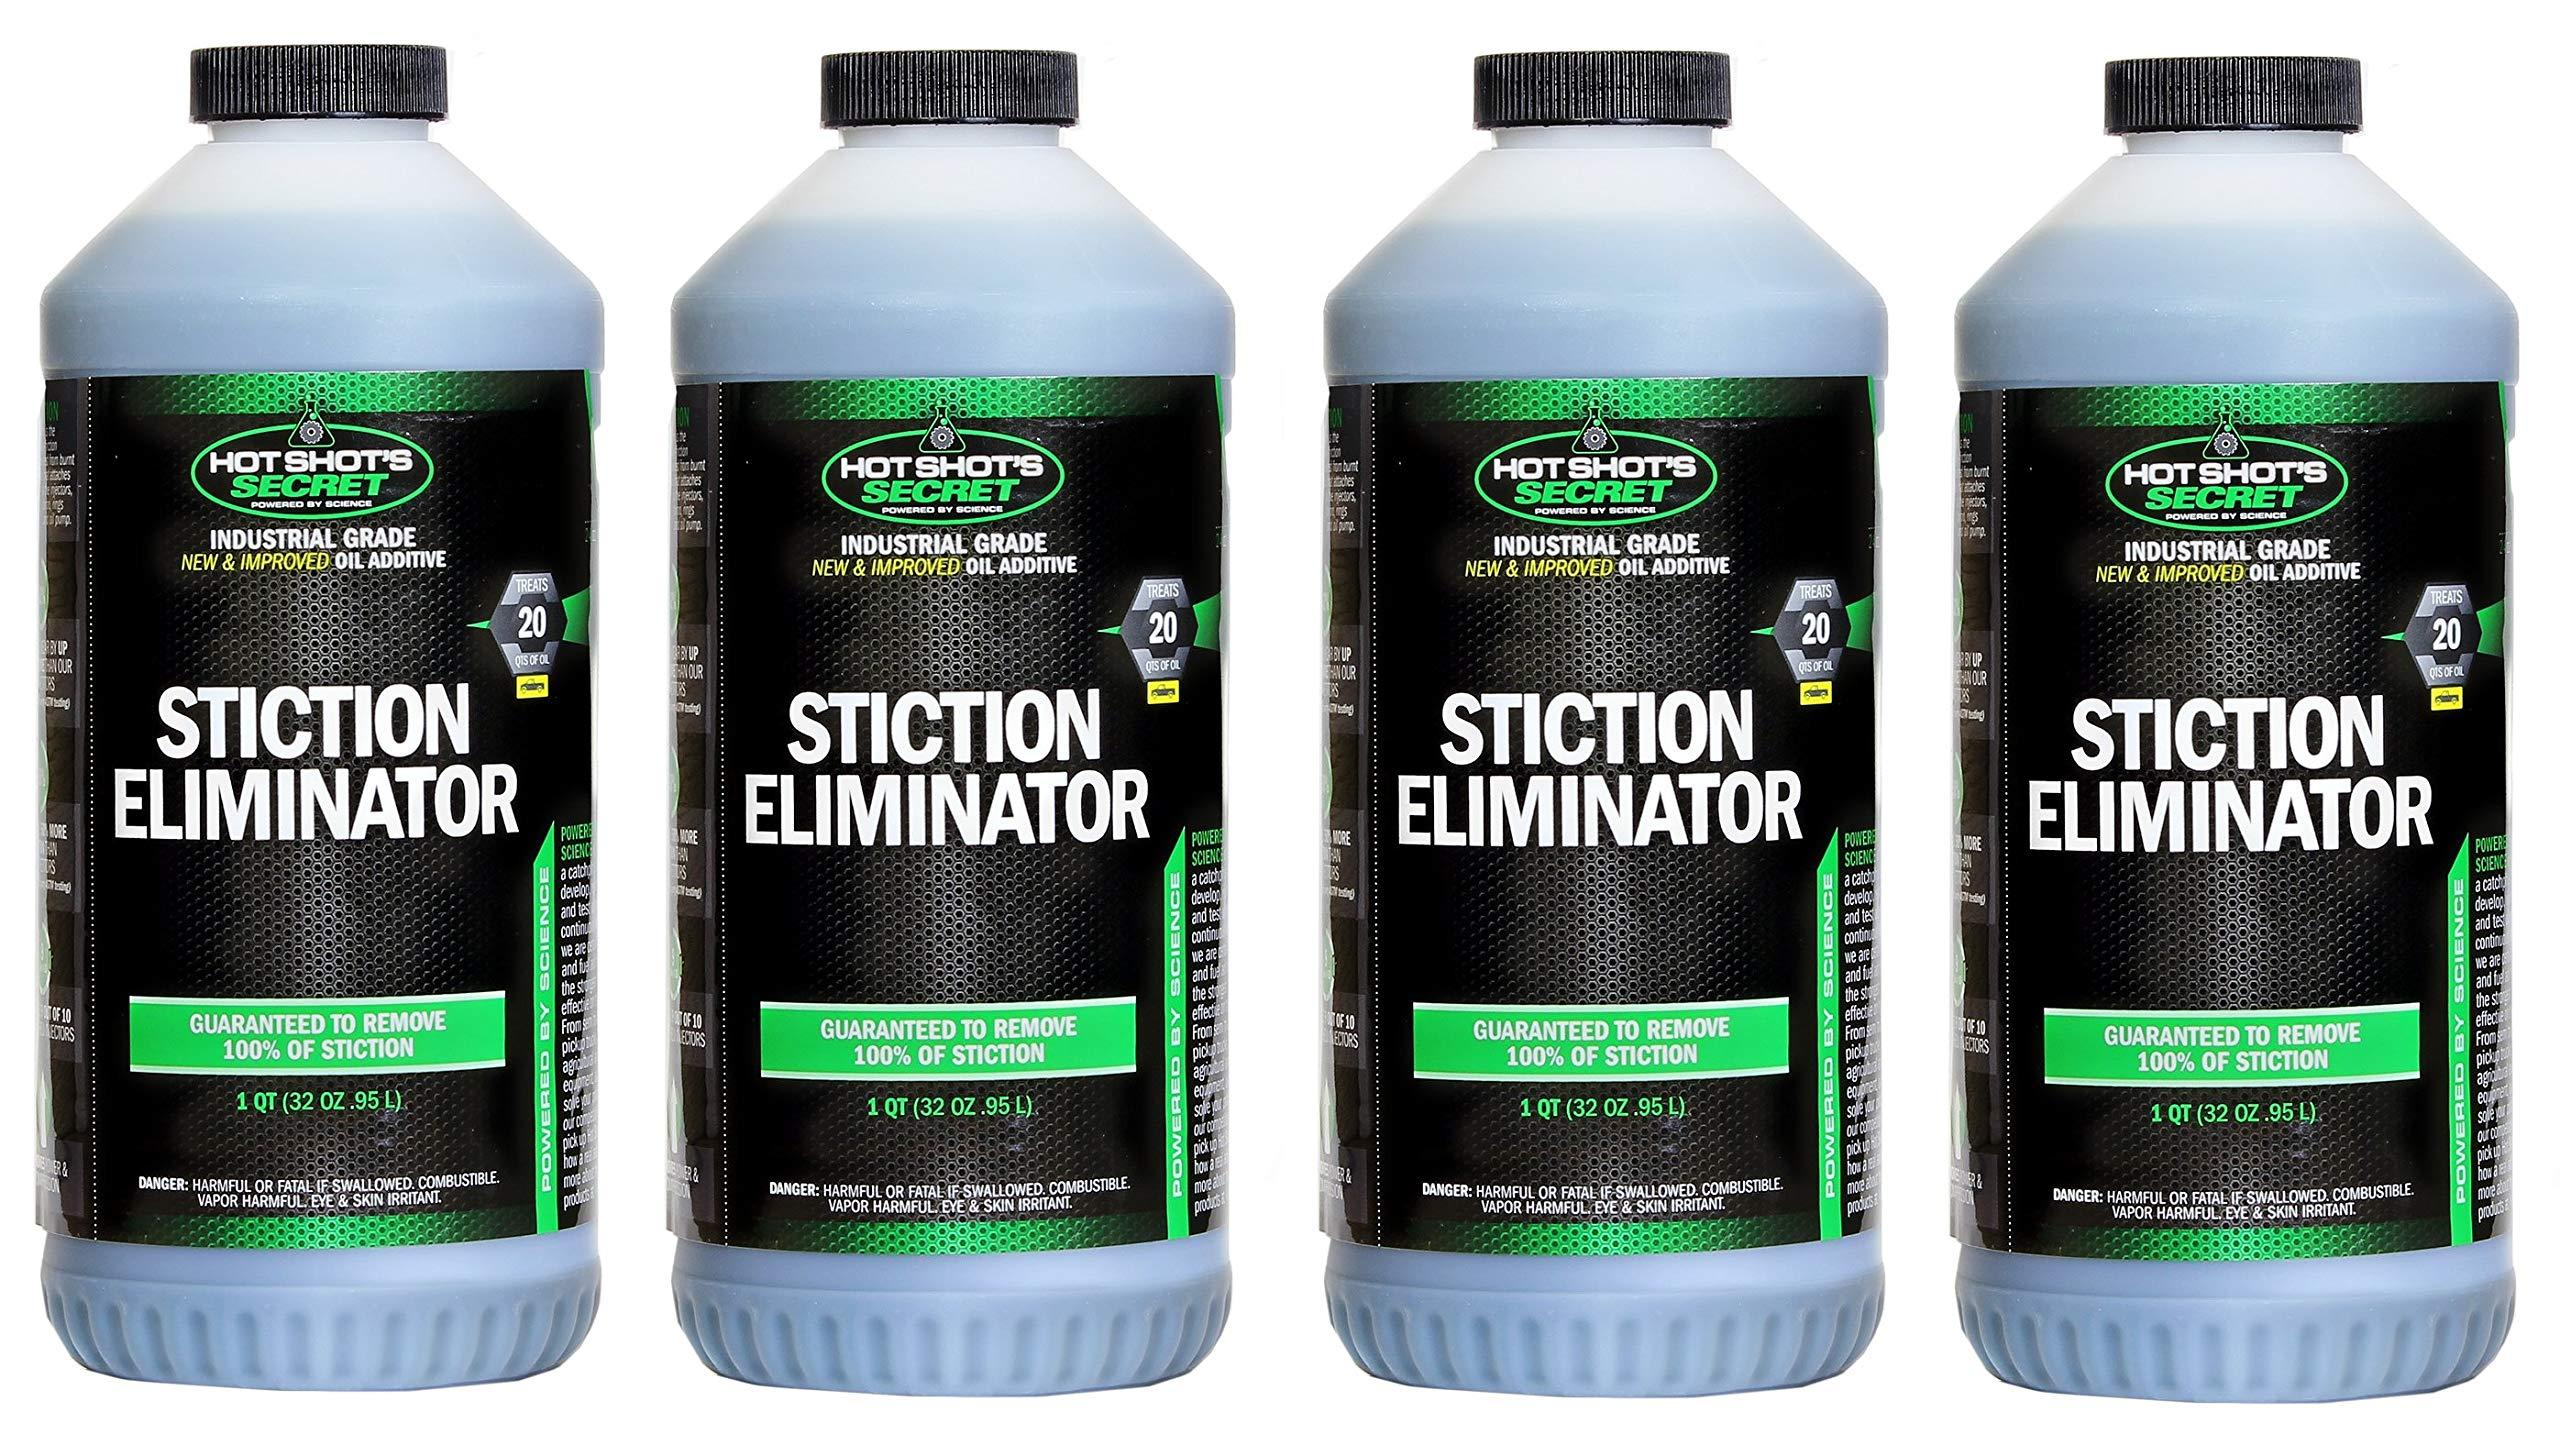 Hot Shot's Secret HSS32Z Stiction Eliminator - 32 fl. oz. (4) by Hot Shot's